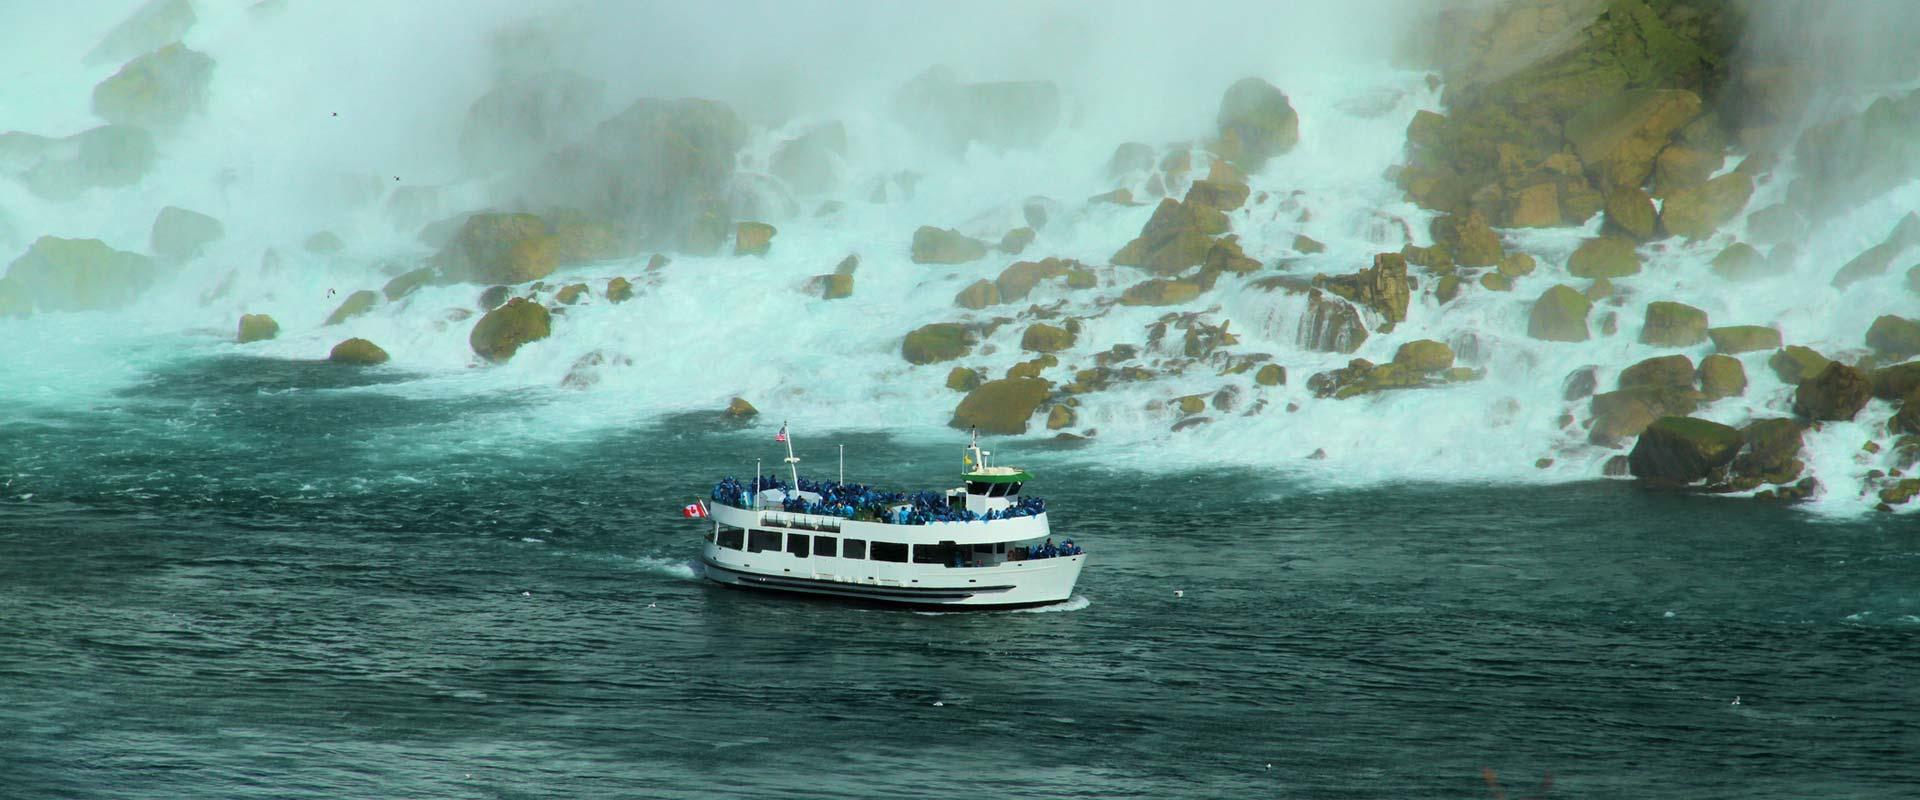 Maid of the Mist – Niagara Falls USA Boat Ride